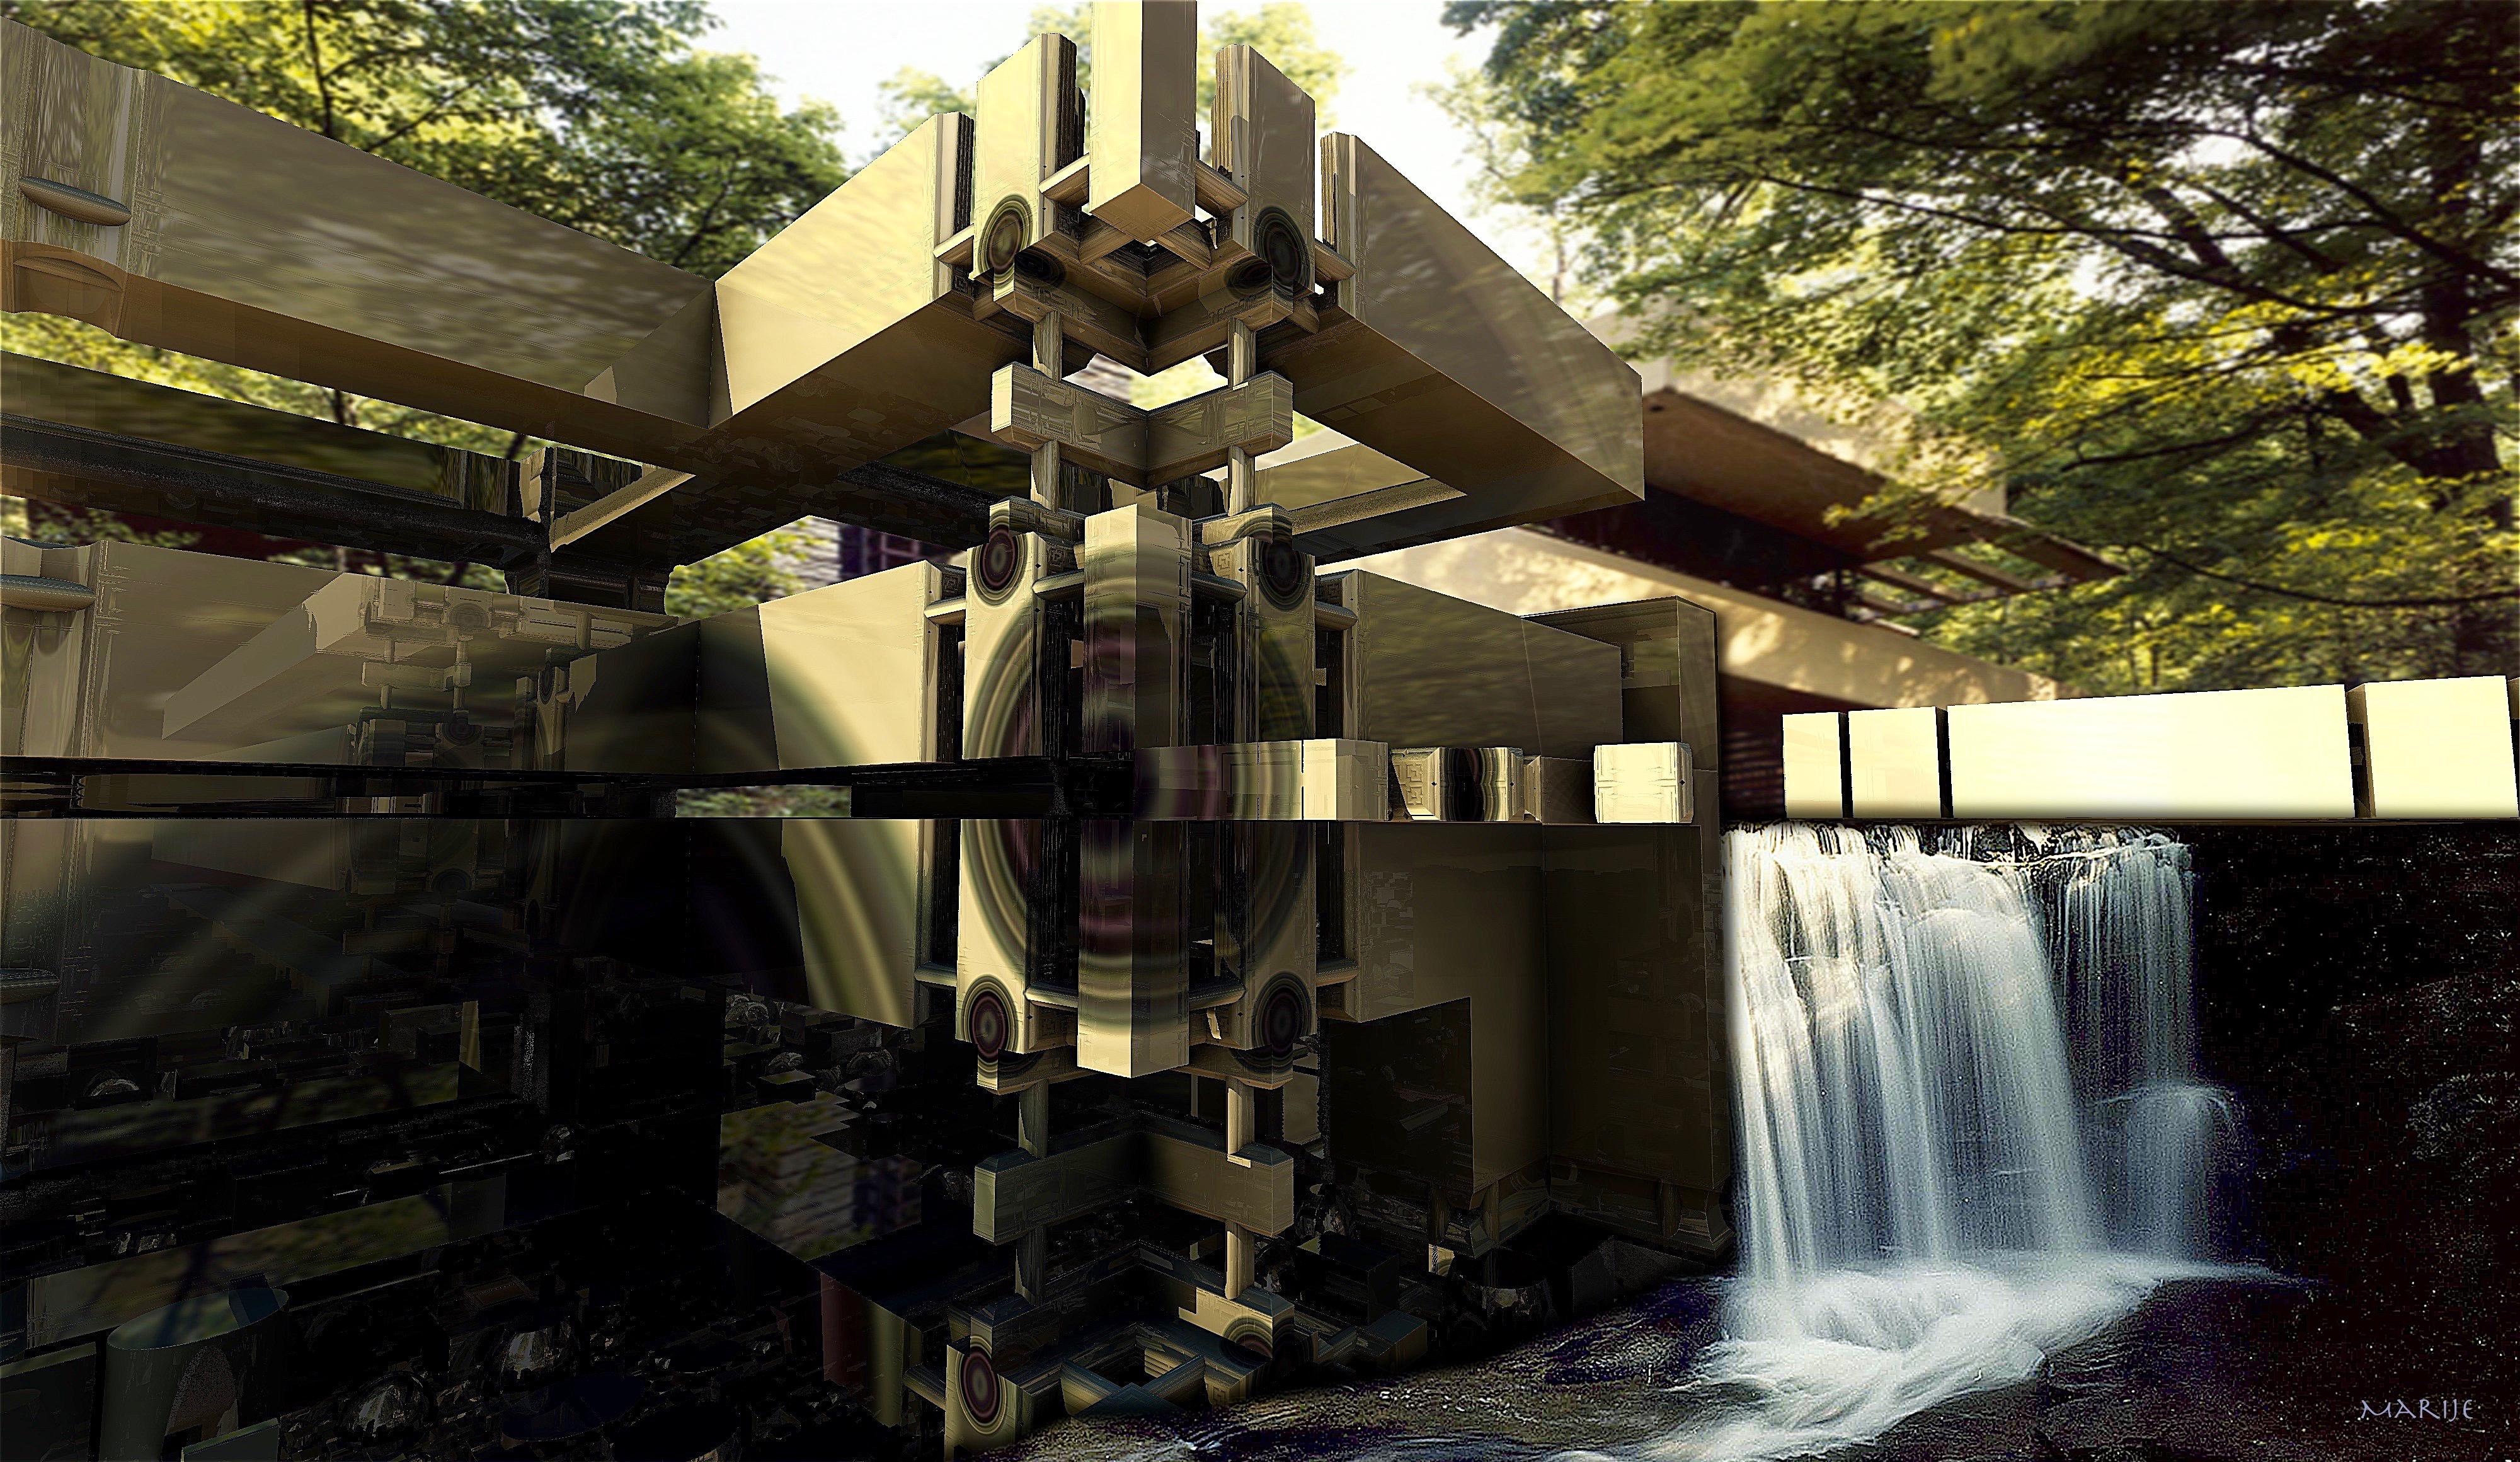 Fallingwater House Frank Lloyd Wright By Marijeberting On